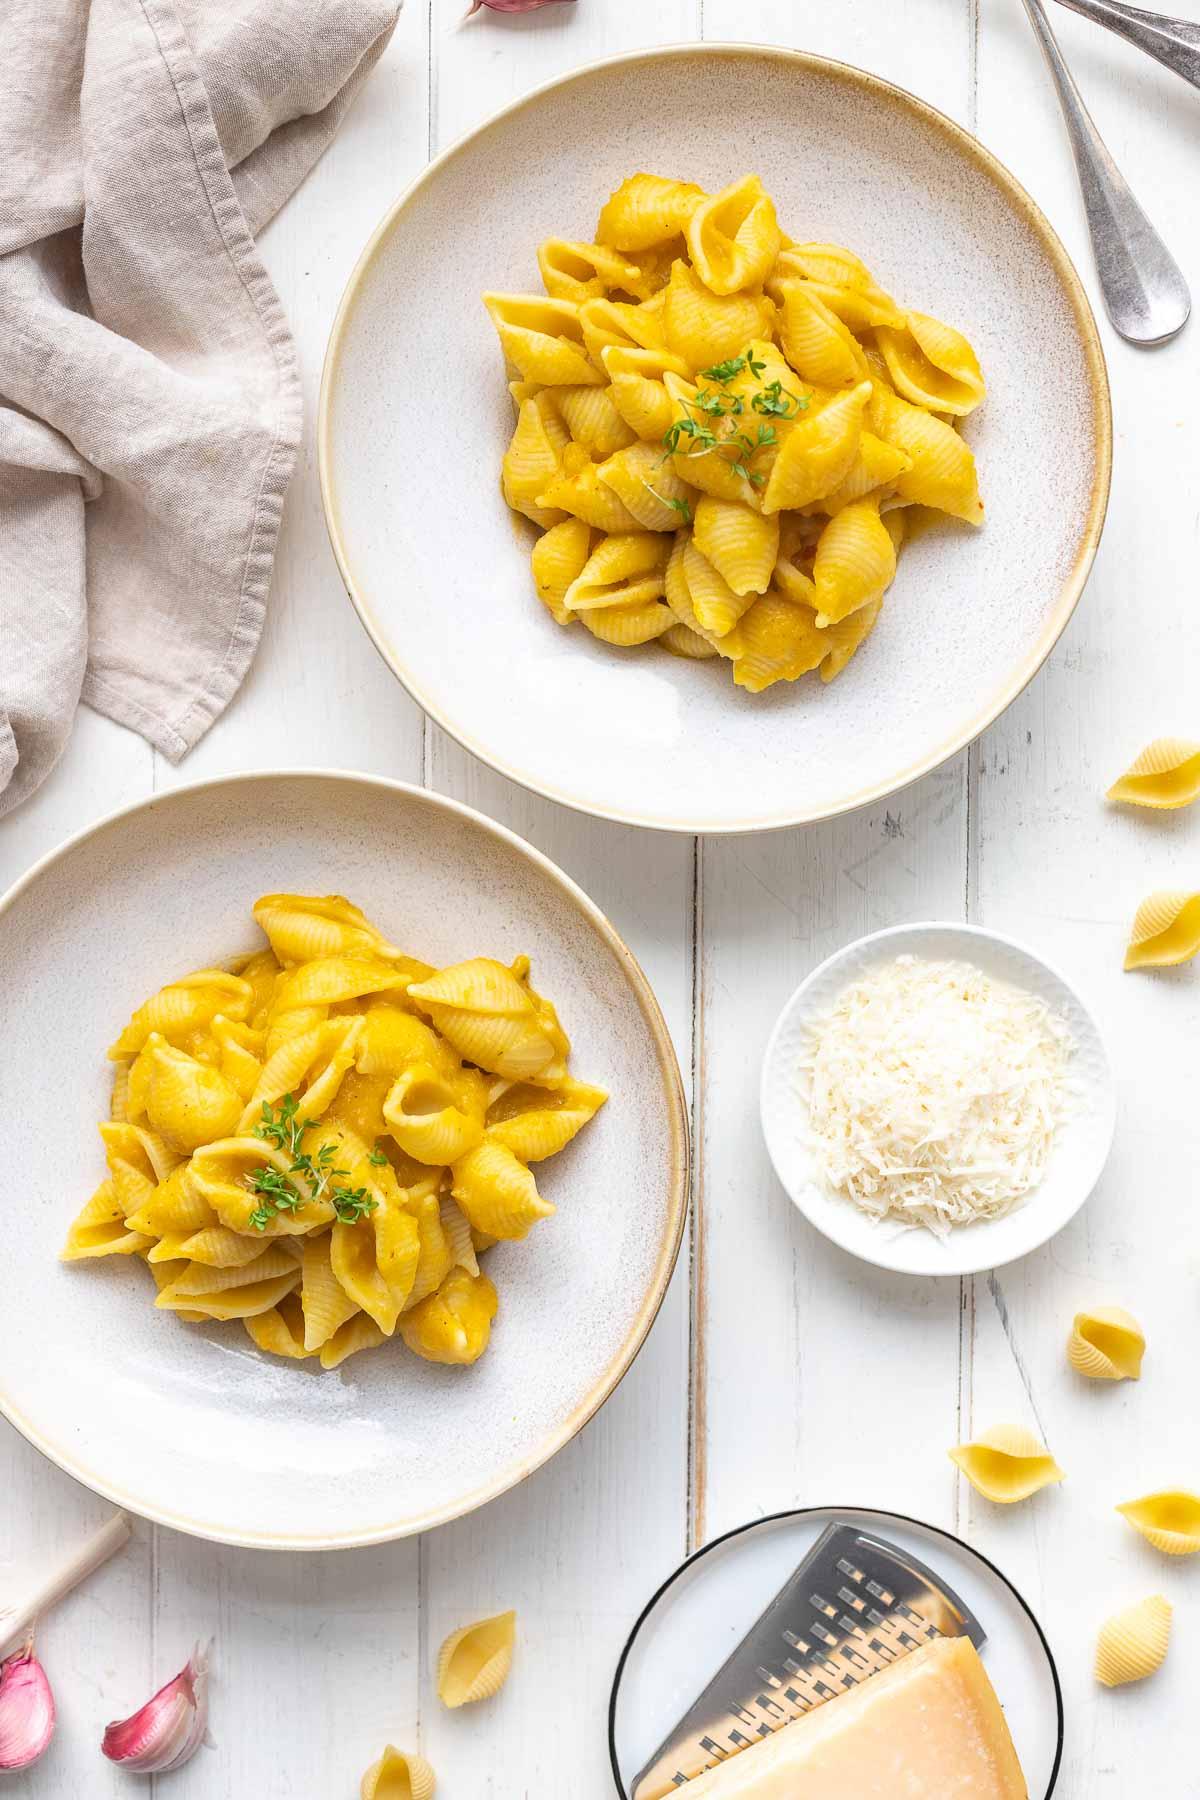 Creamy Butternut Squash Pasta (vegan) with Ral el Hanout